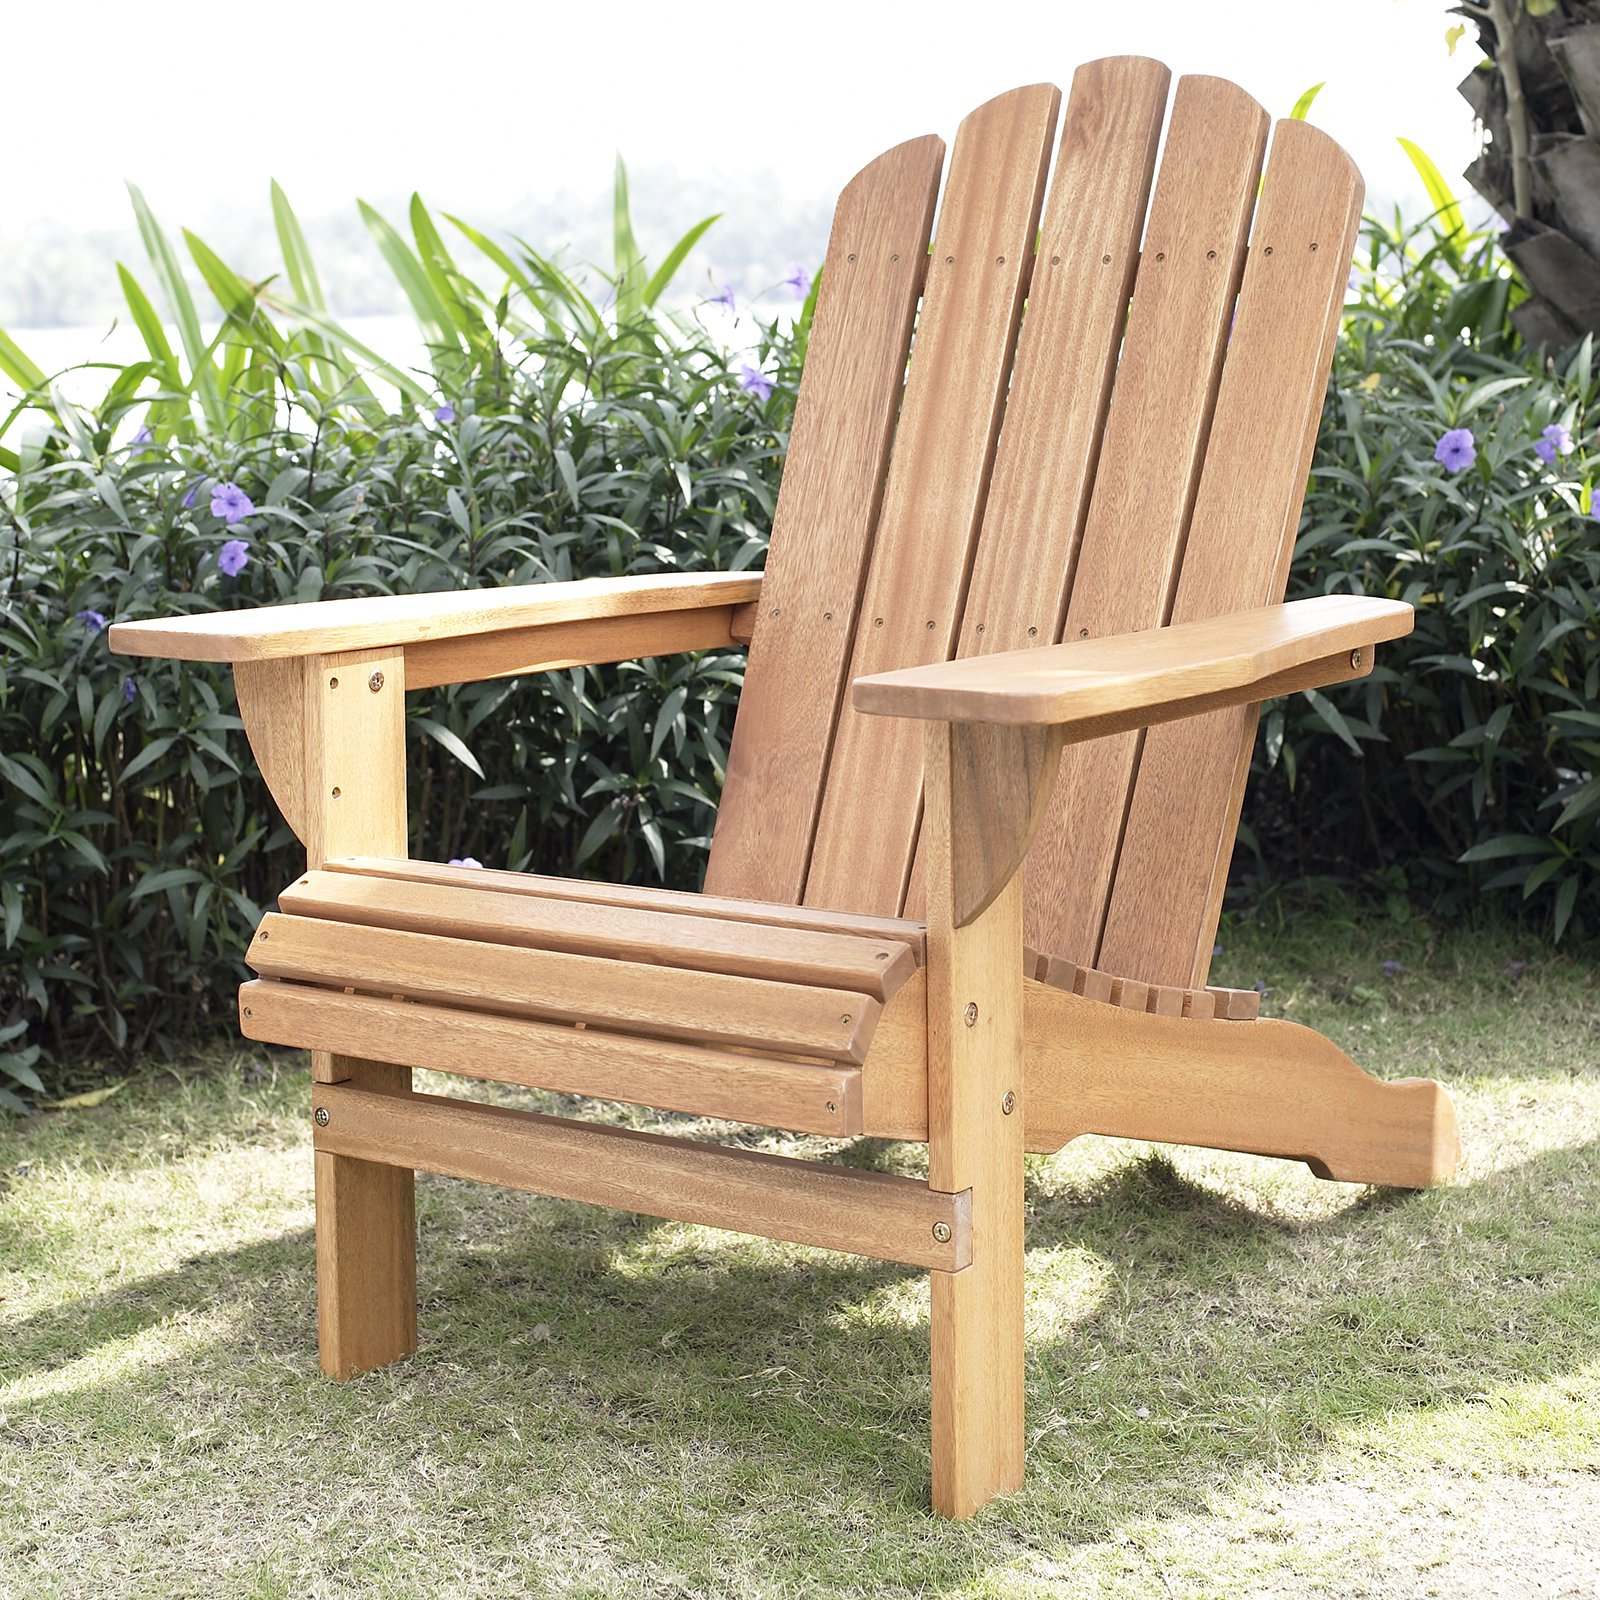 & Belham Living Shoreline Adirondack Chair - Natural - Walmart.com